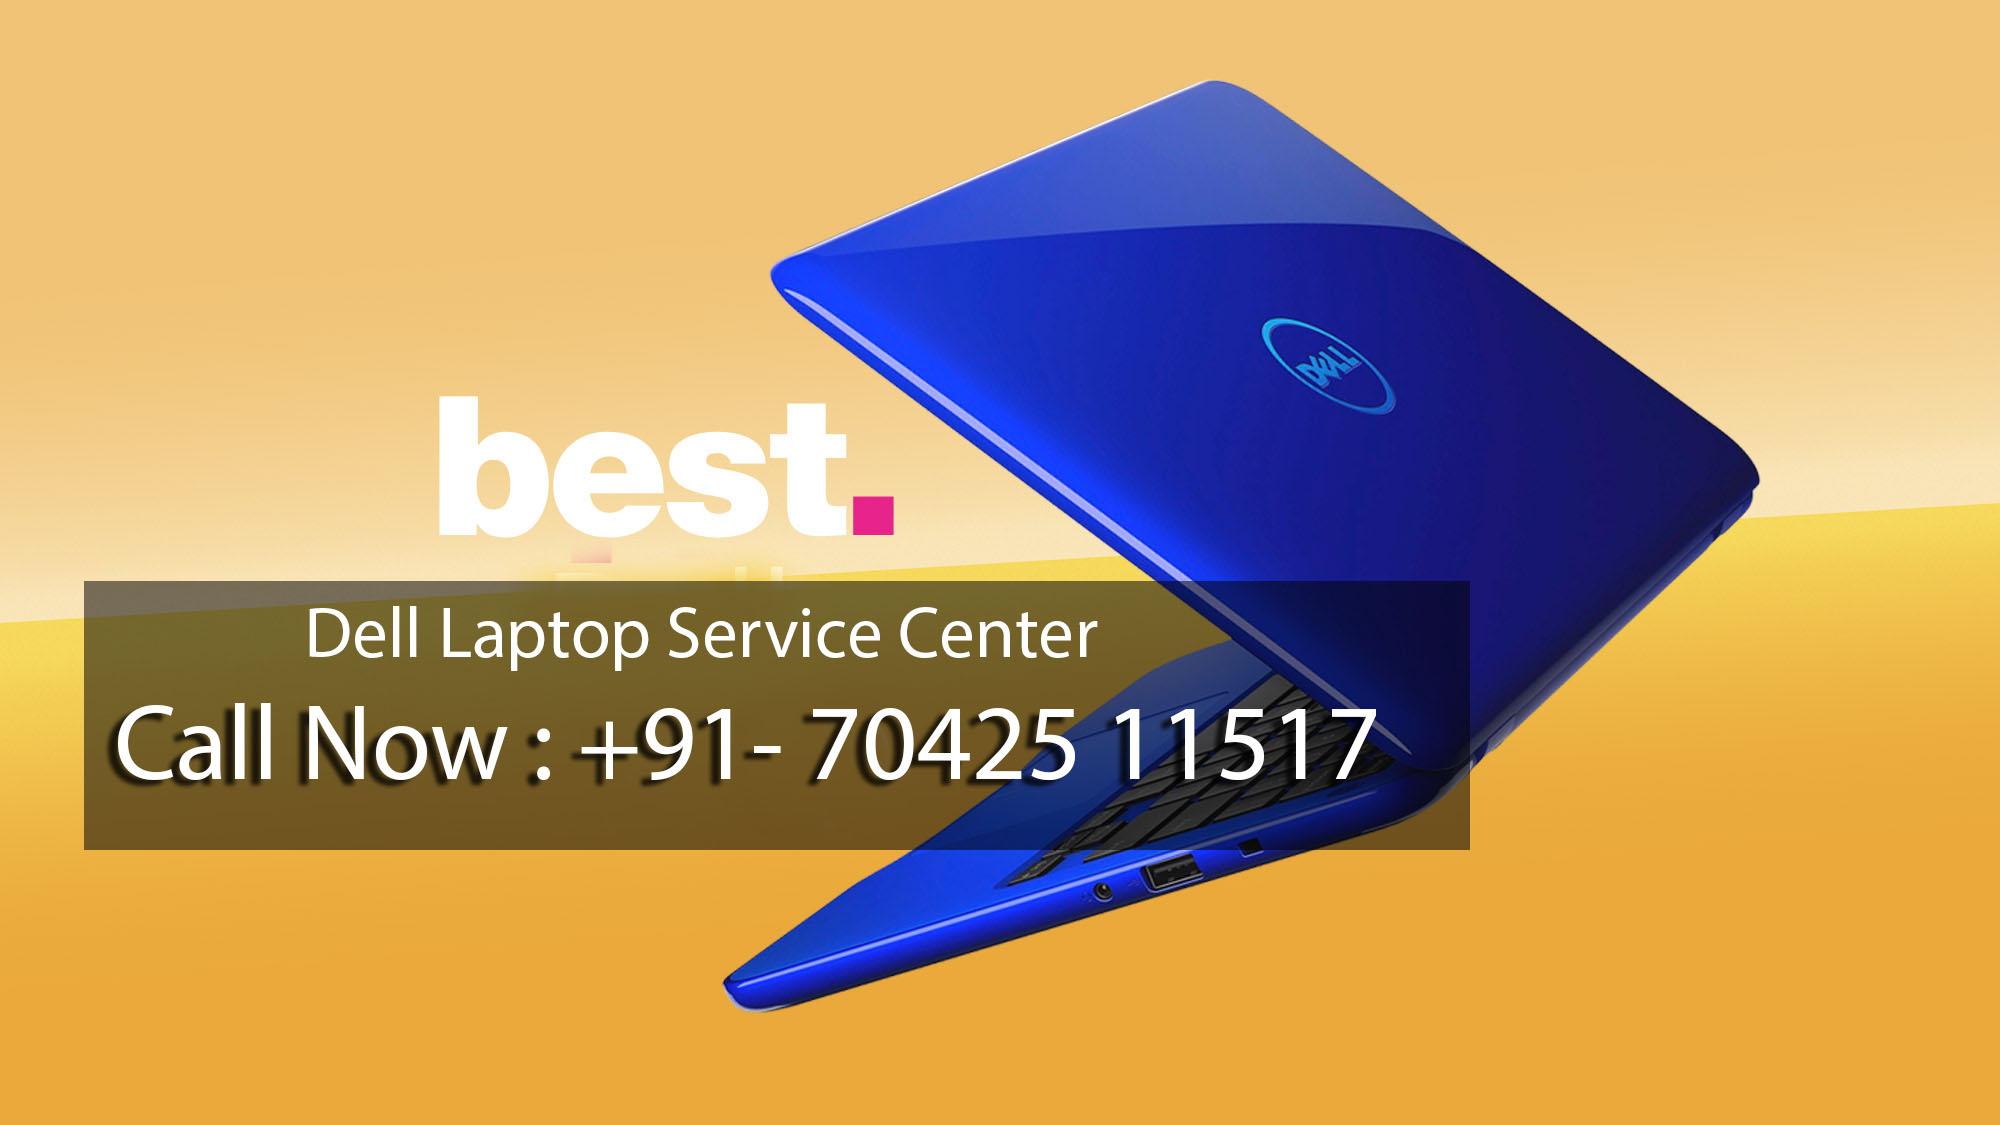 Dell Service Center in Ajit Nagar